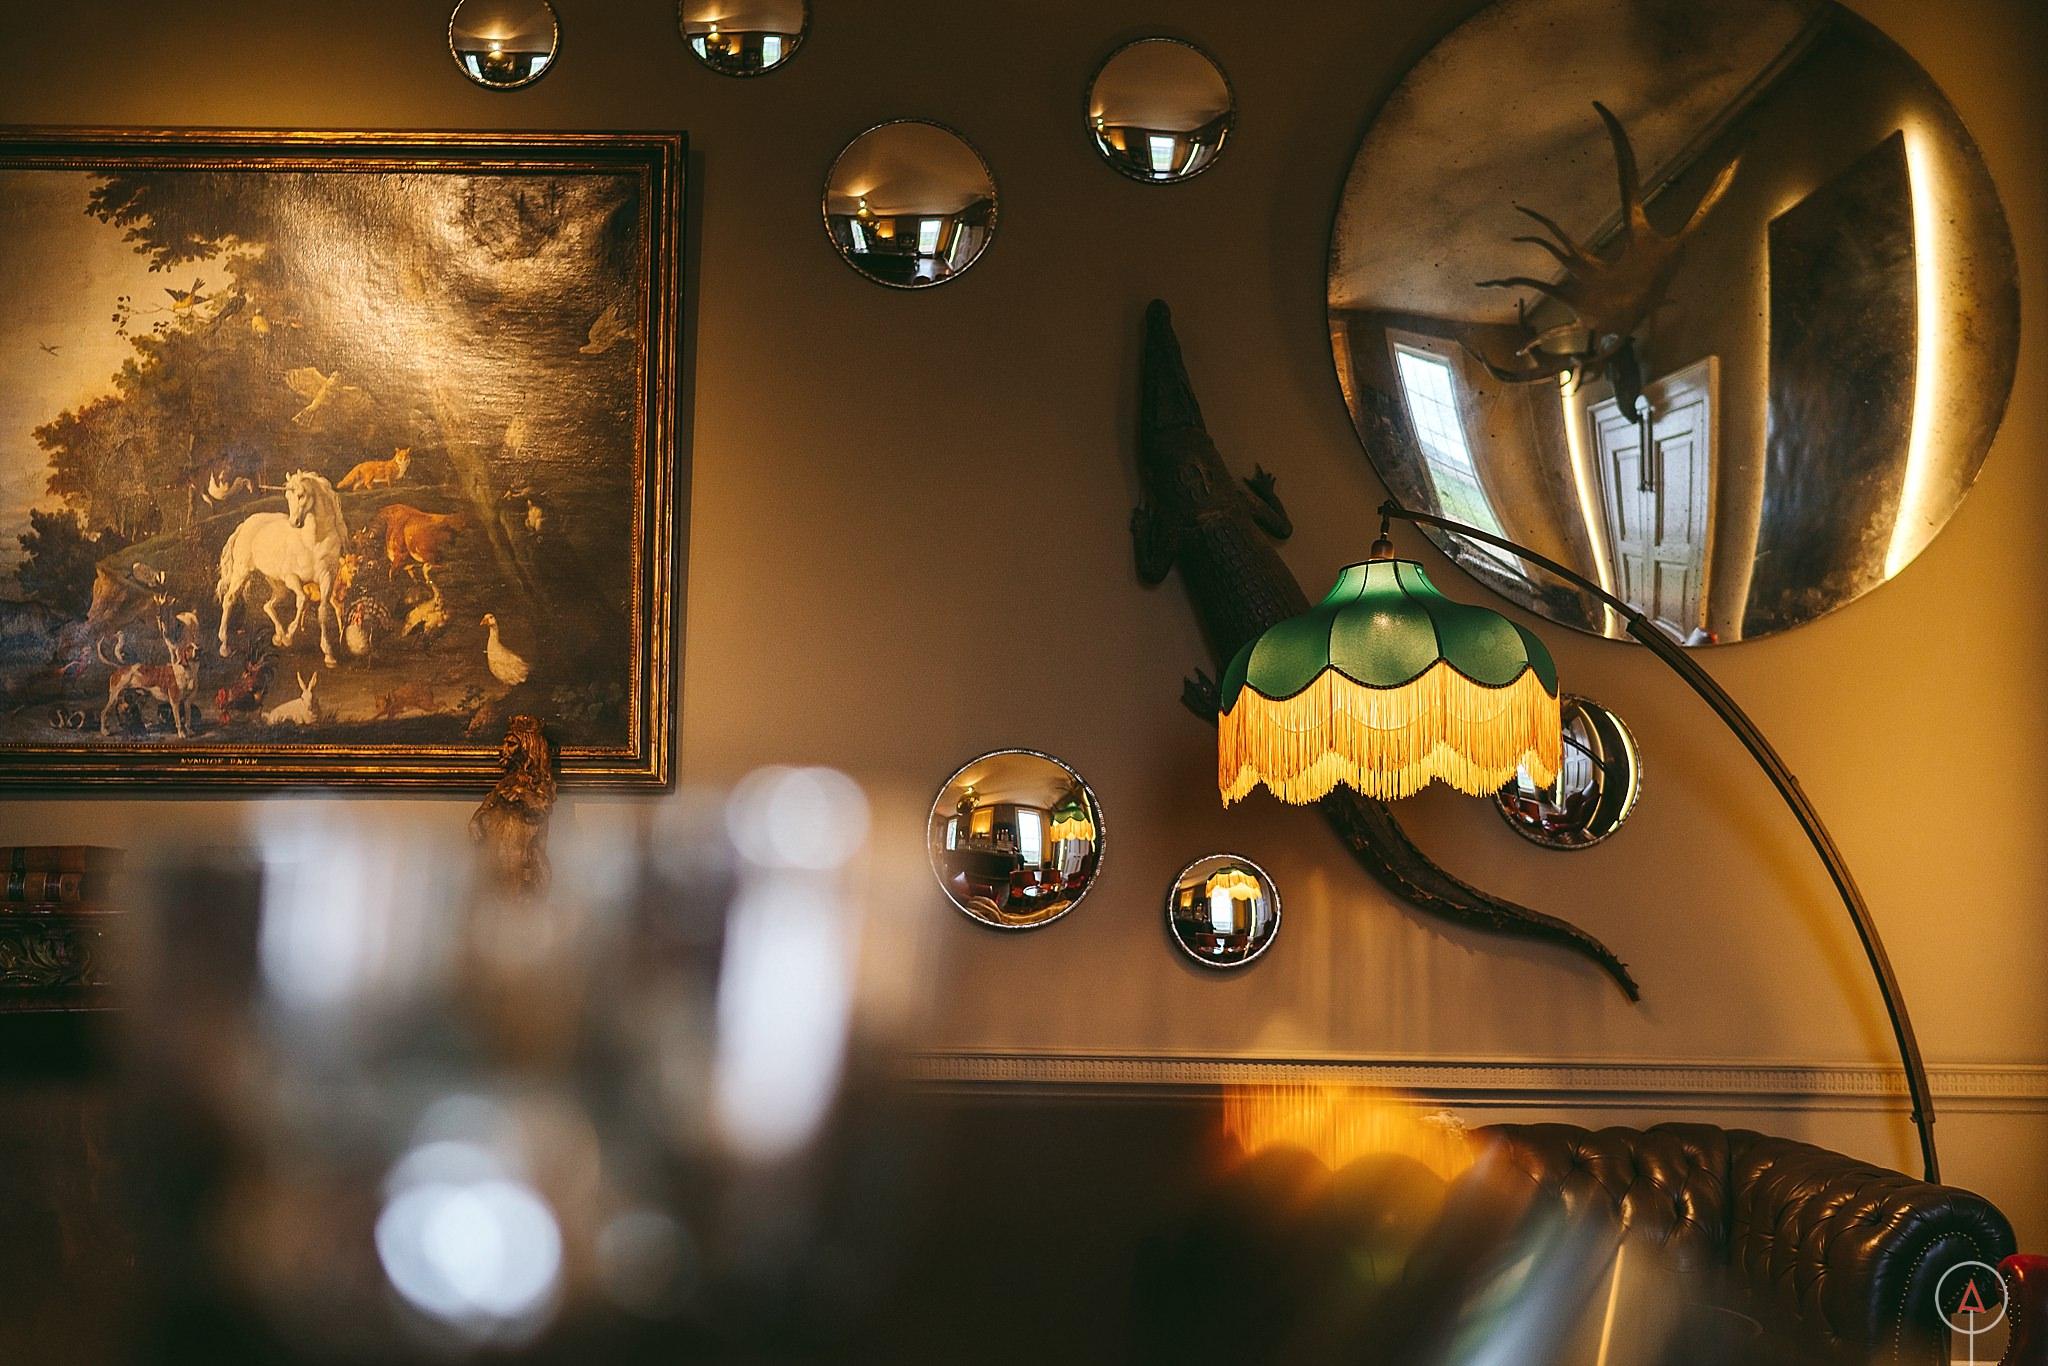 cardiff-wedding-photographer-aga-tomaszek_0299